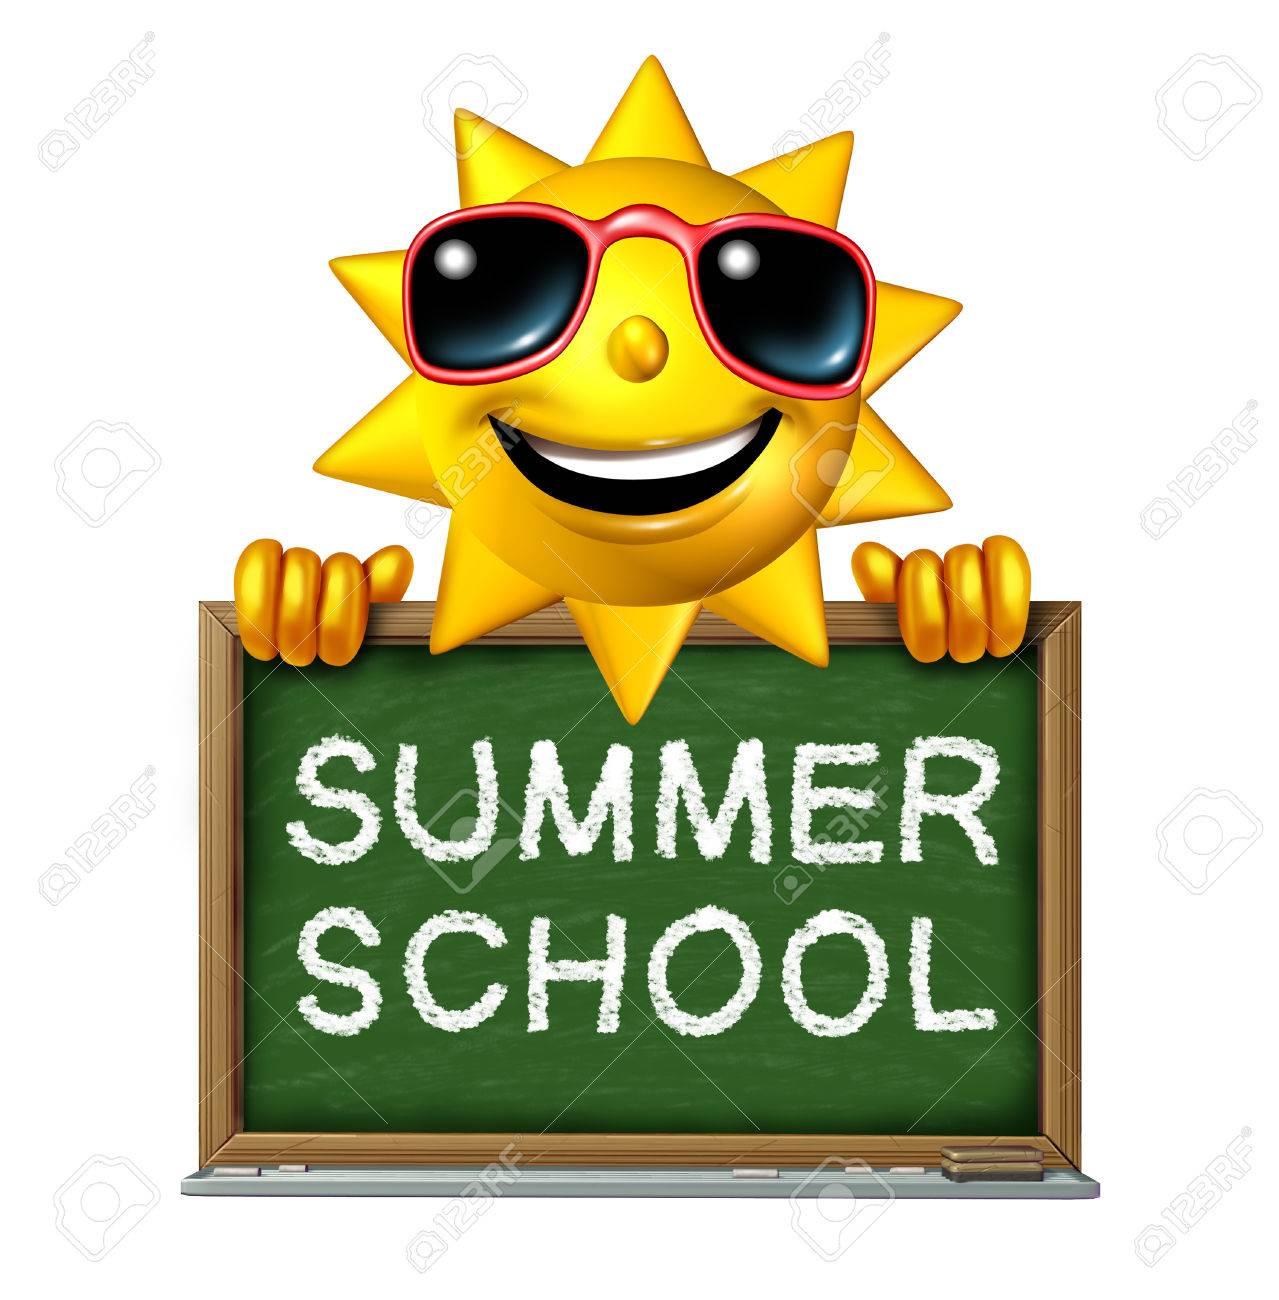 Summer School Education Concept As A Happy Fun Three Dimensional